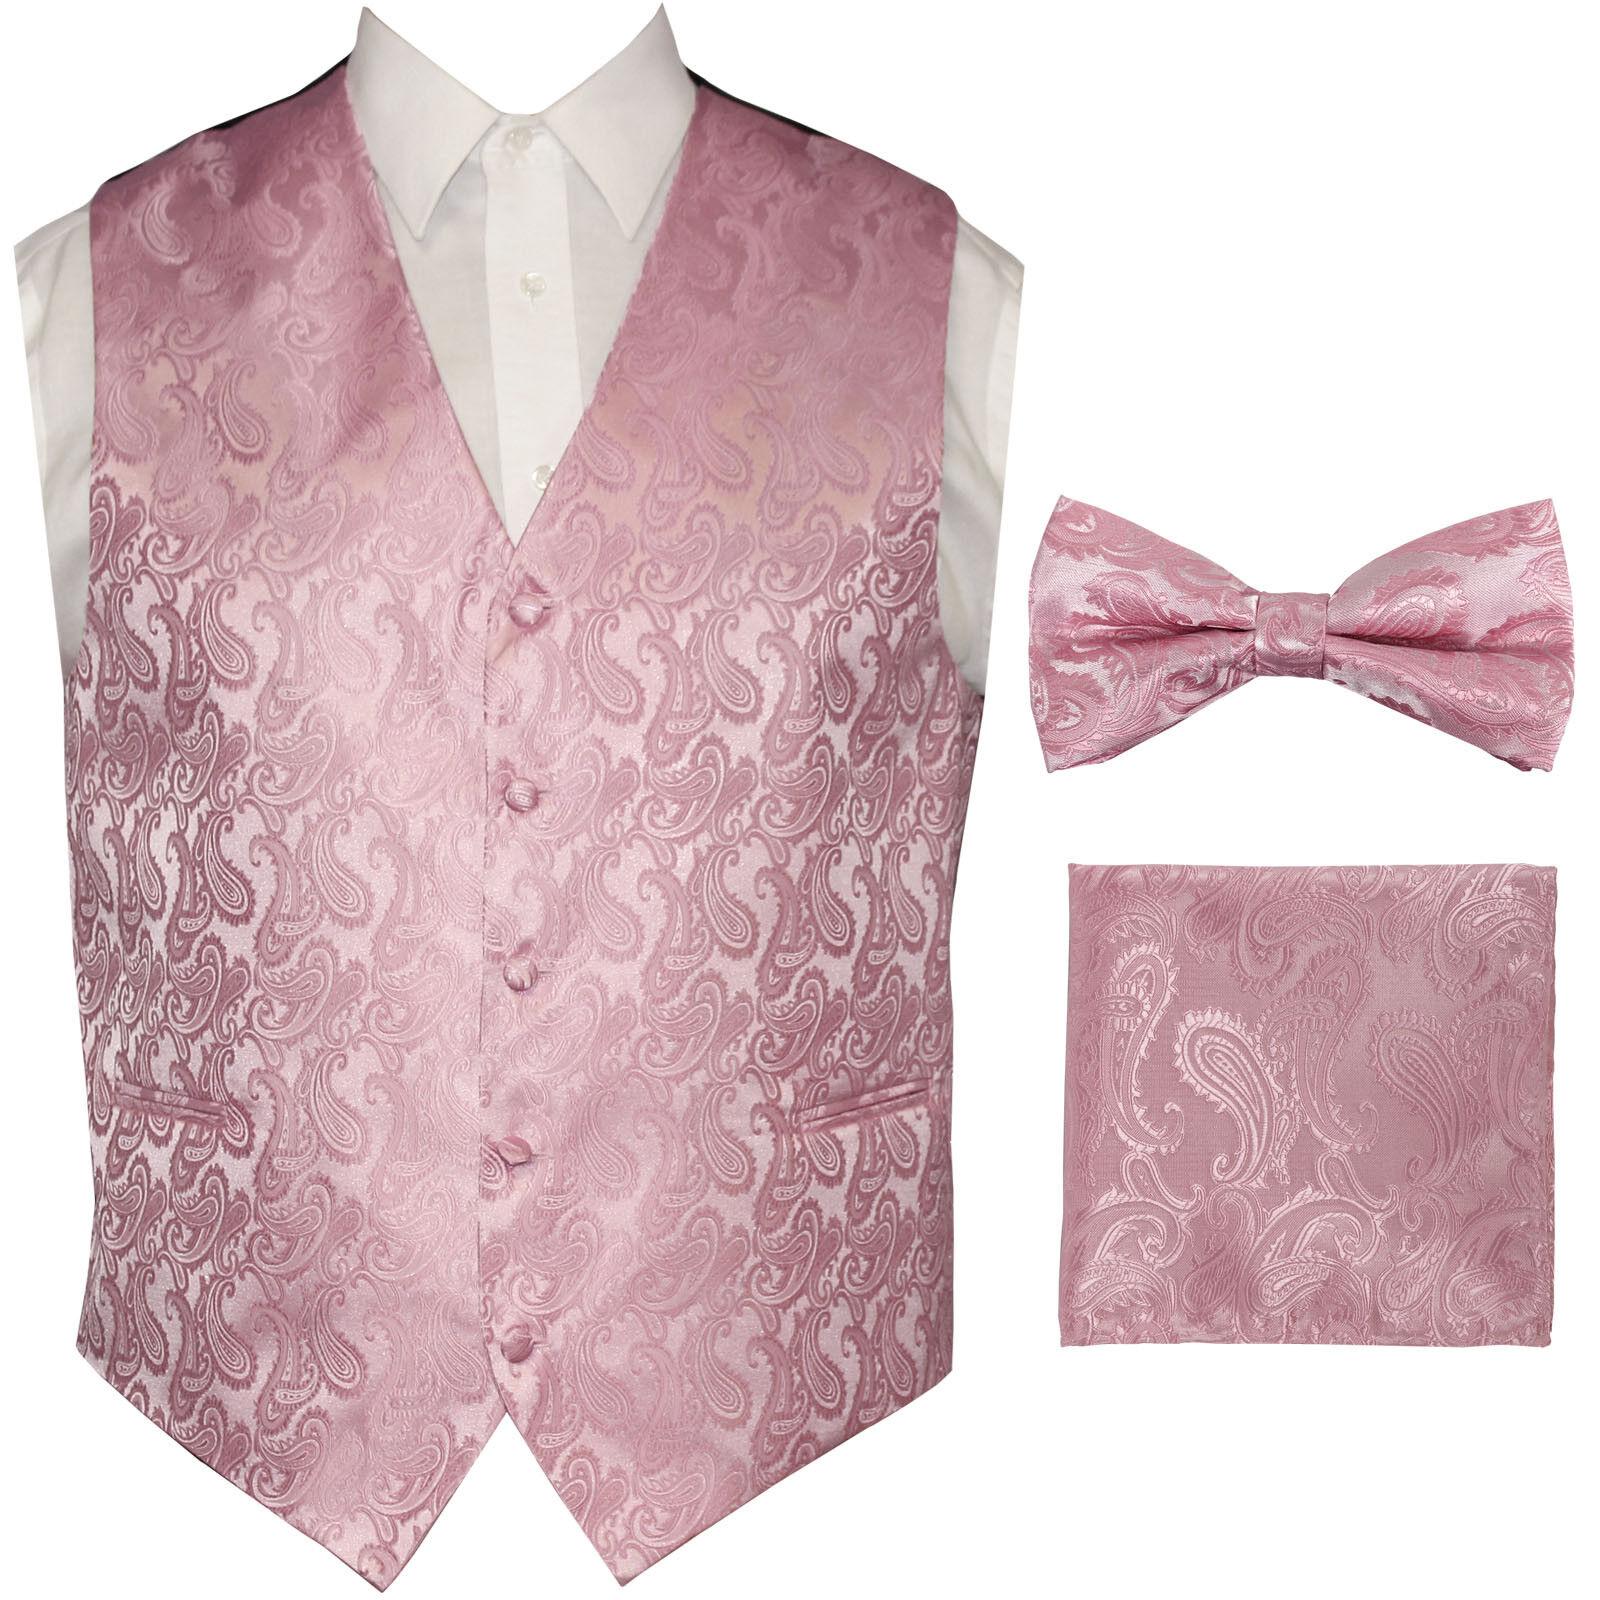 Light Pink Paisley Tuxedo Suit Dress Vest Waistcoat Bow tie Hankie Wedding Prom